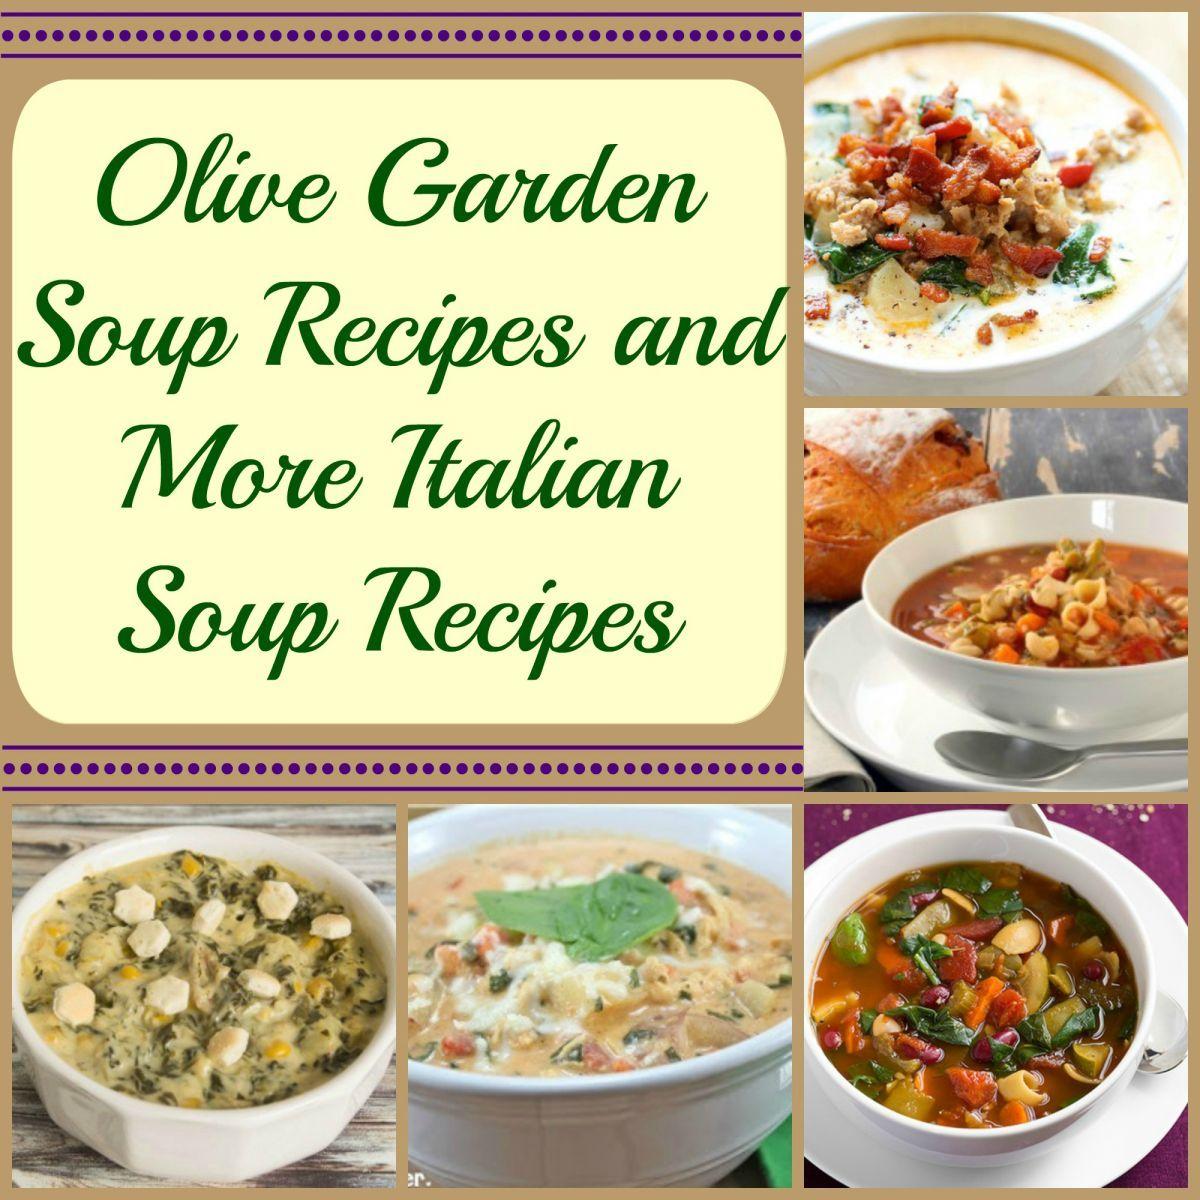 11 Olive Garden Soup Recipes Food recipes, Italian